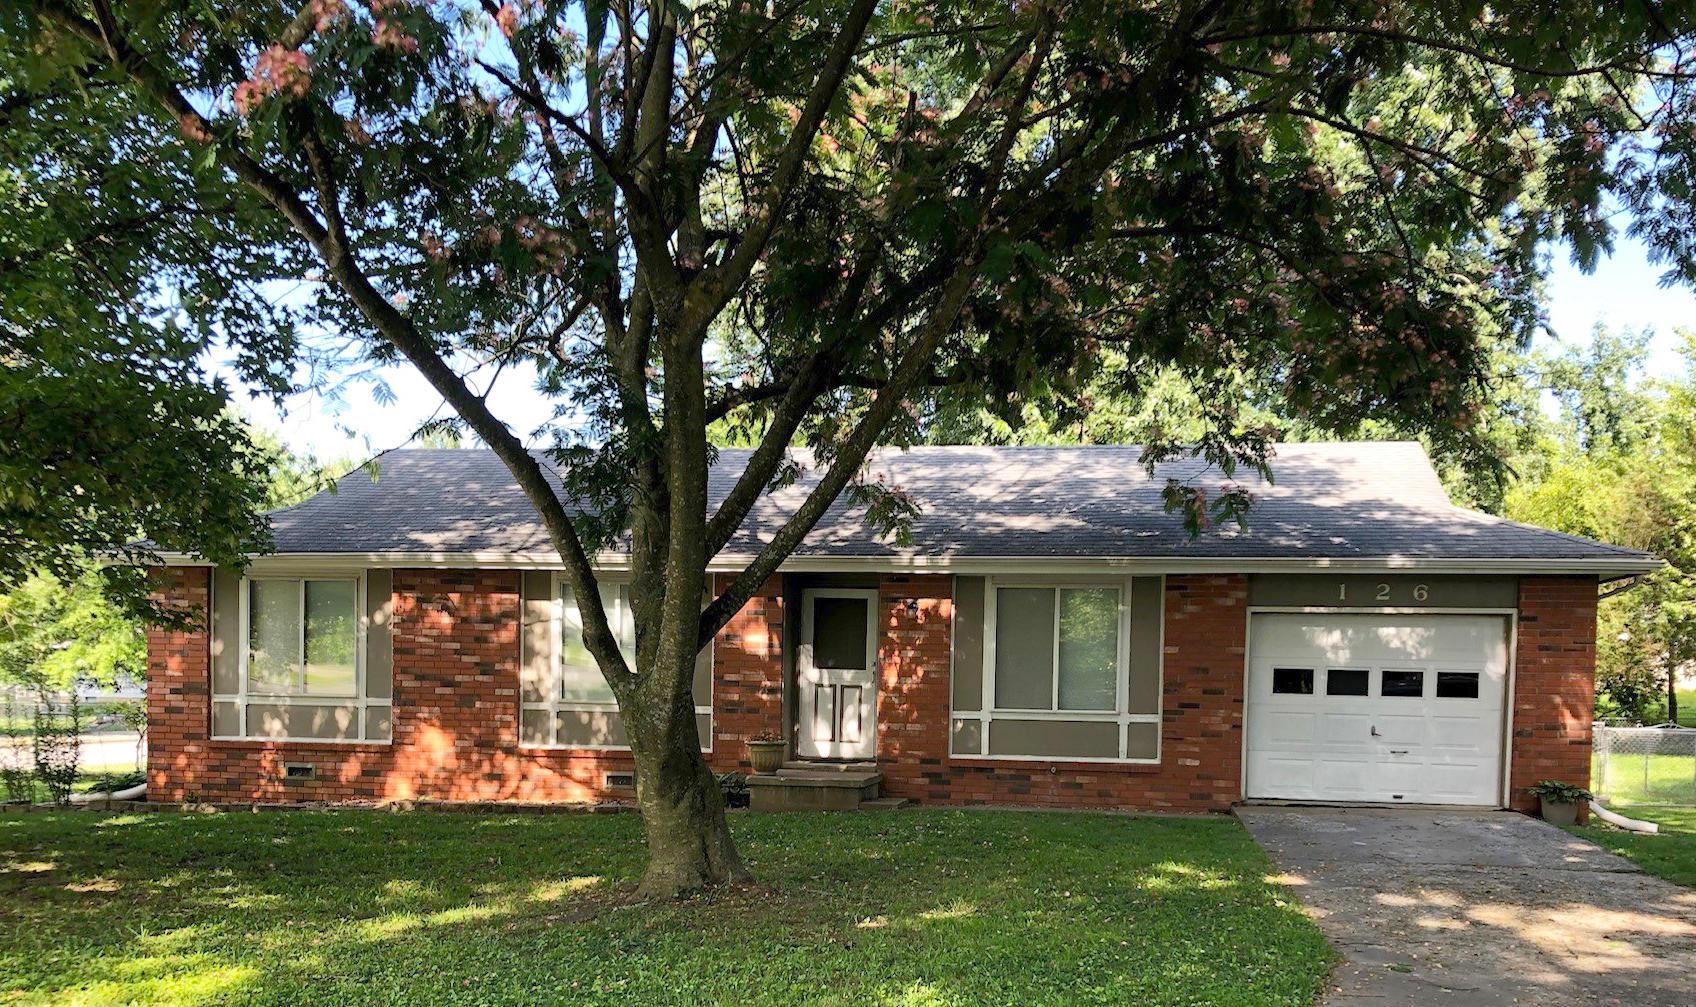 126 North Pinewood Avenue Republic, MO 65738